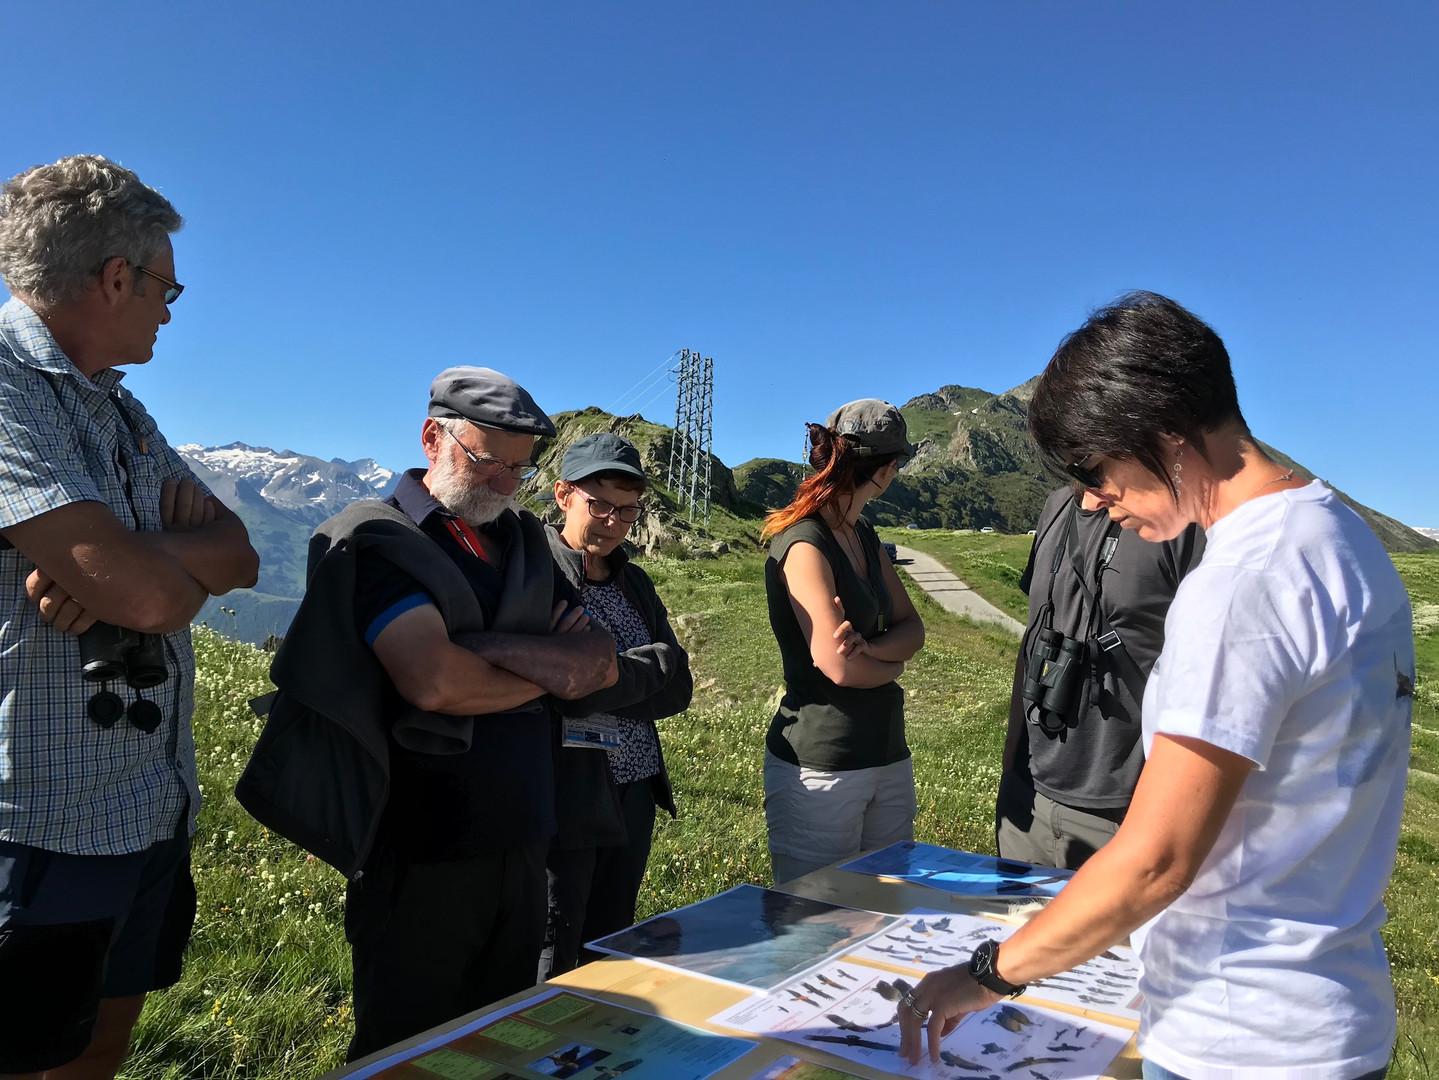 Ecrins de nature 2018 Oisans-27.JPG